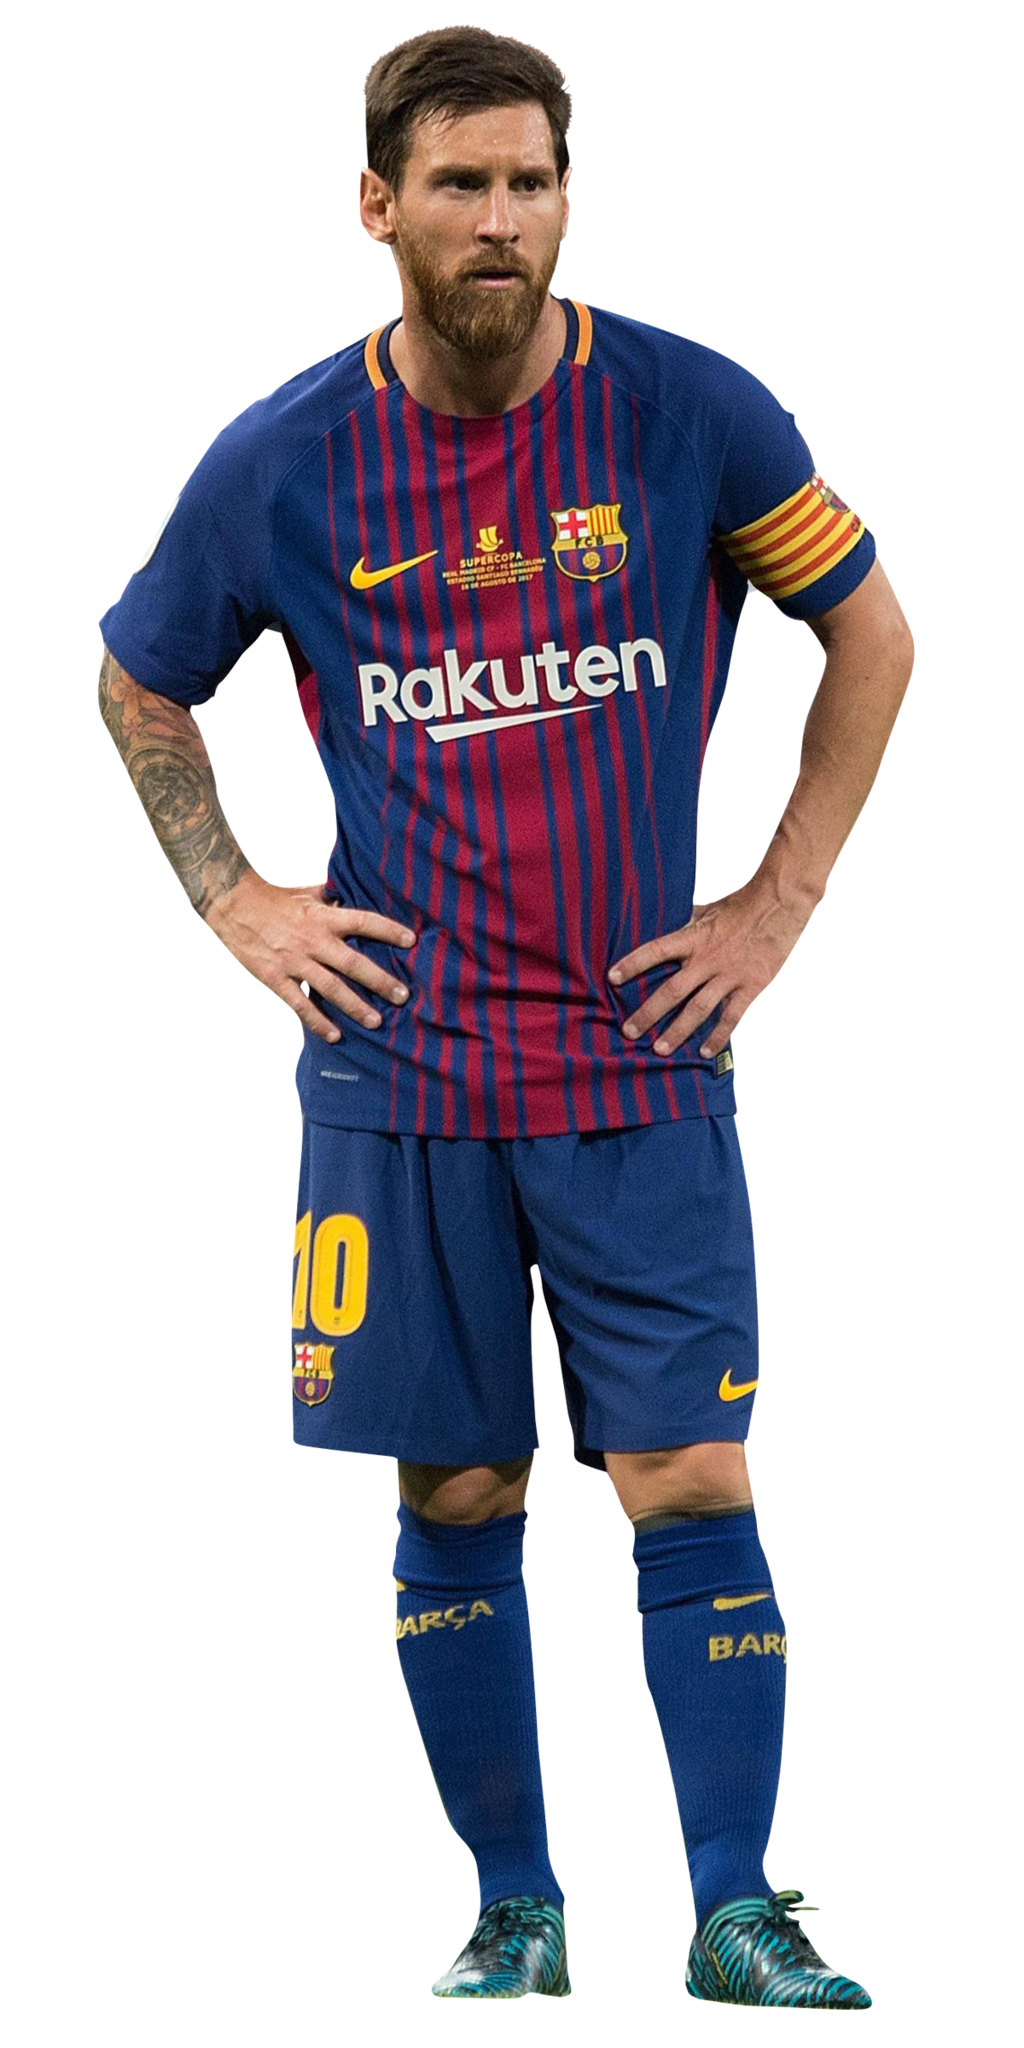 Lionel messi clipart 2018 clipart download Lionel Messi 2018 Png 10 By Flashdsg clipart download